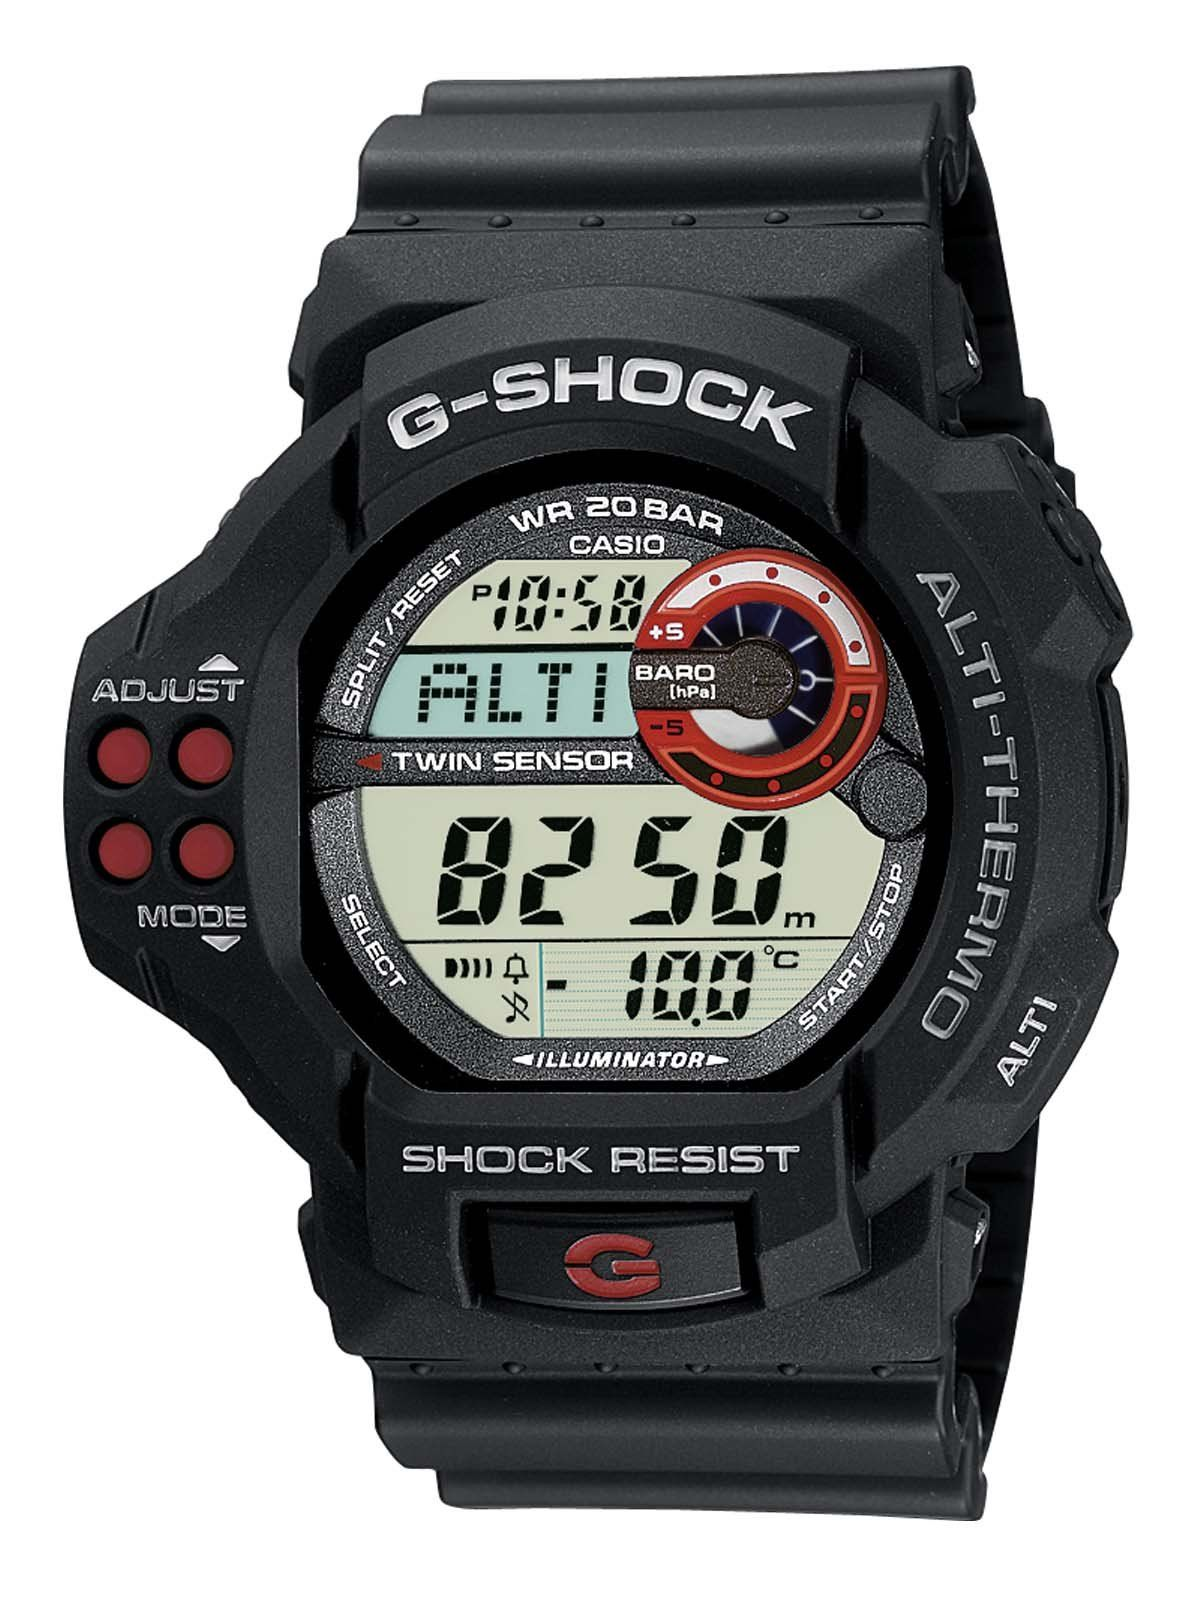 Casio Men's GShock Digital Watch Gdf1001Aer With Resin